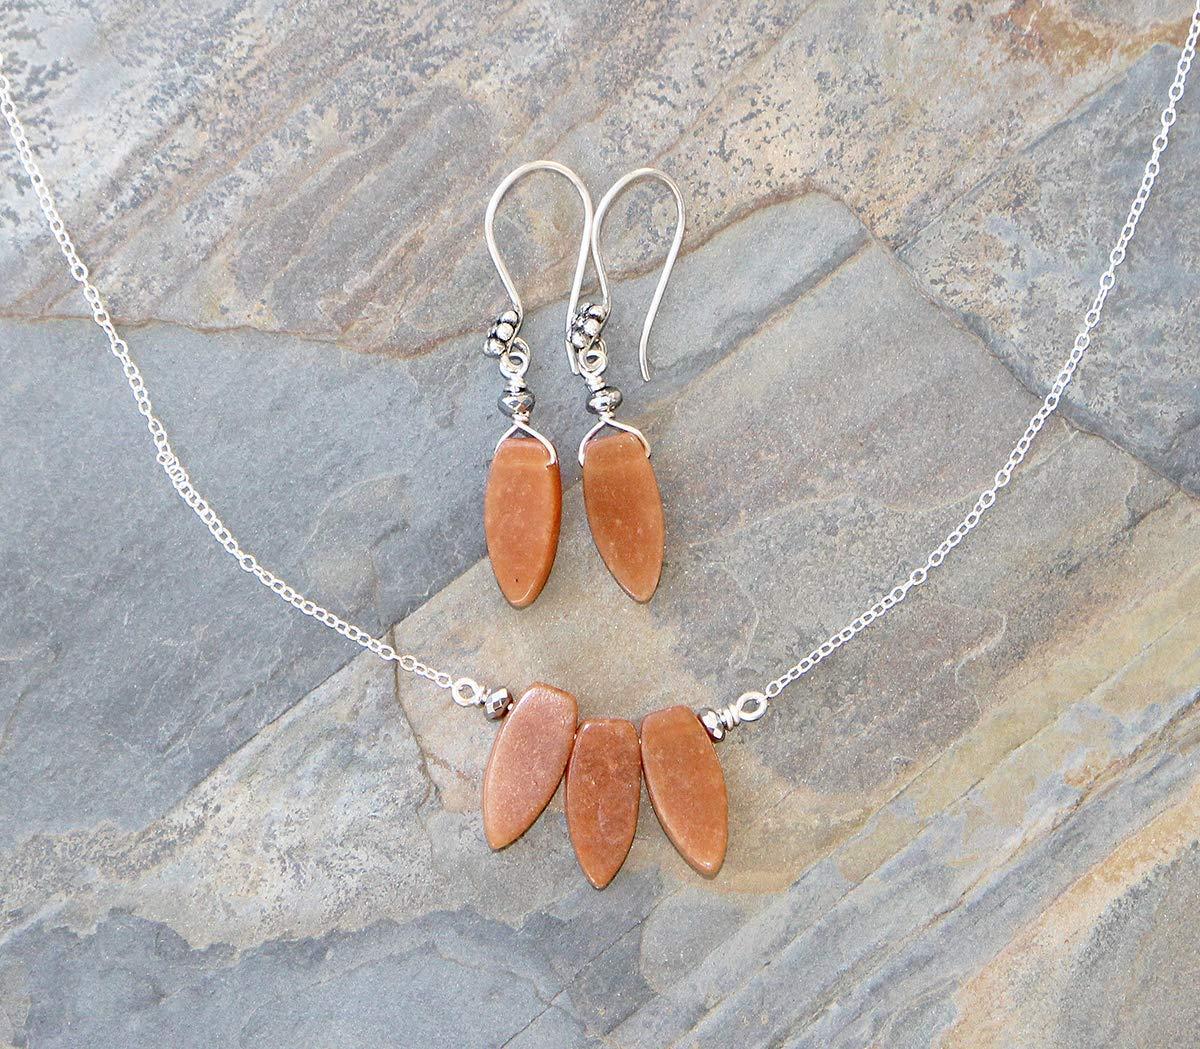 Orange Jewelry Set, Carnelian Jewelry Set, Natural Stone Jewelry Set, Bohemian Jewelry Set, Handmade Jewelry Set, Boho Jewelry Set, For Her